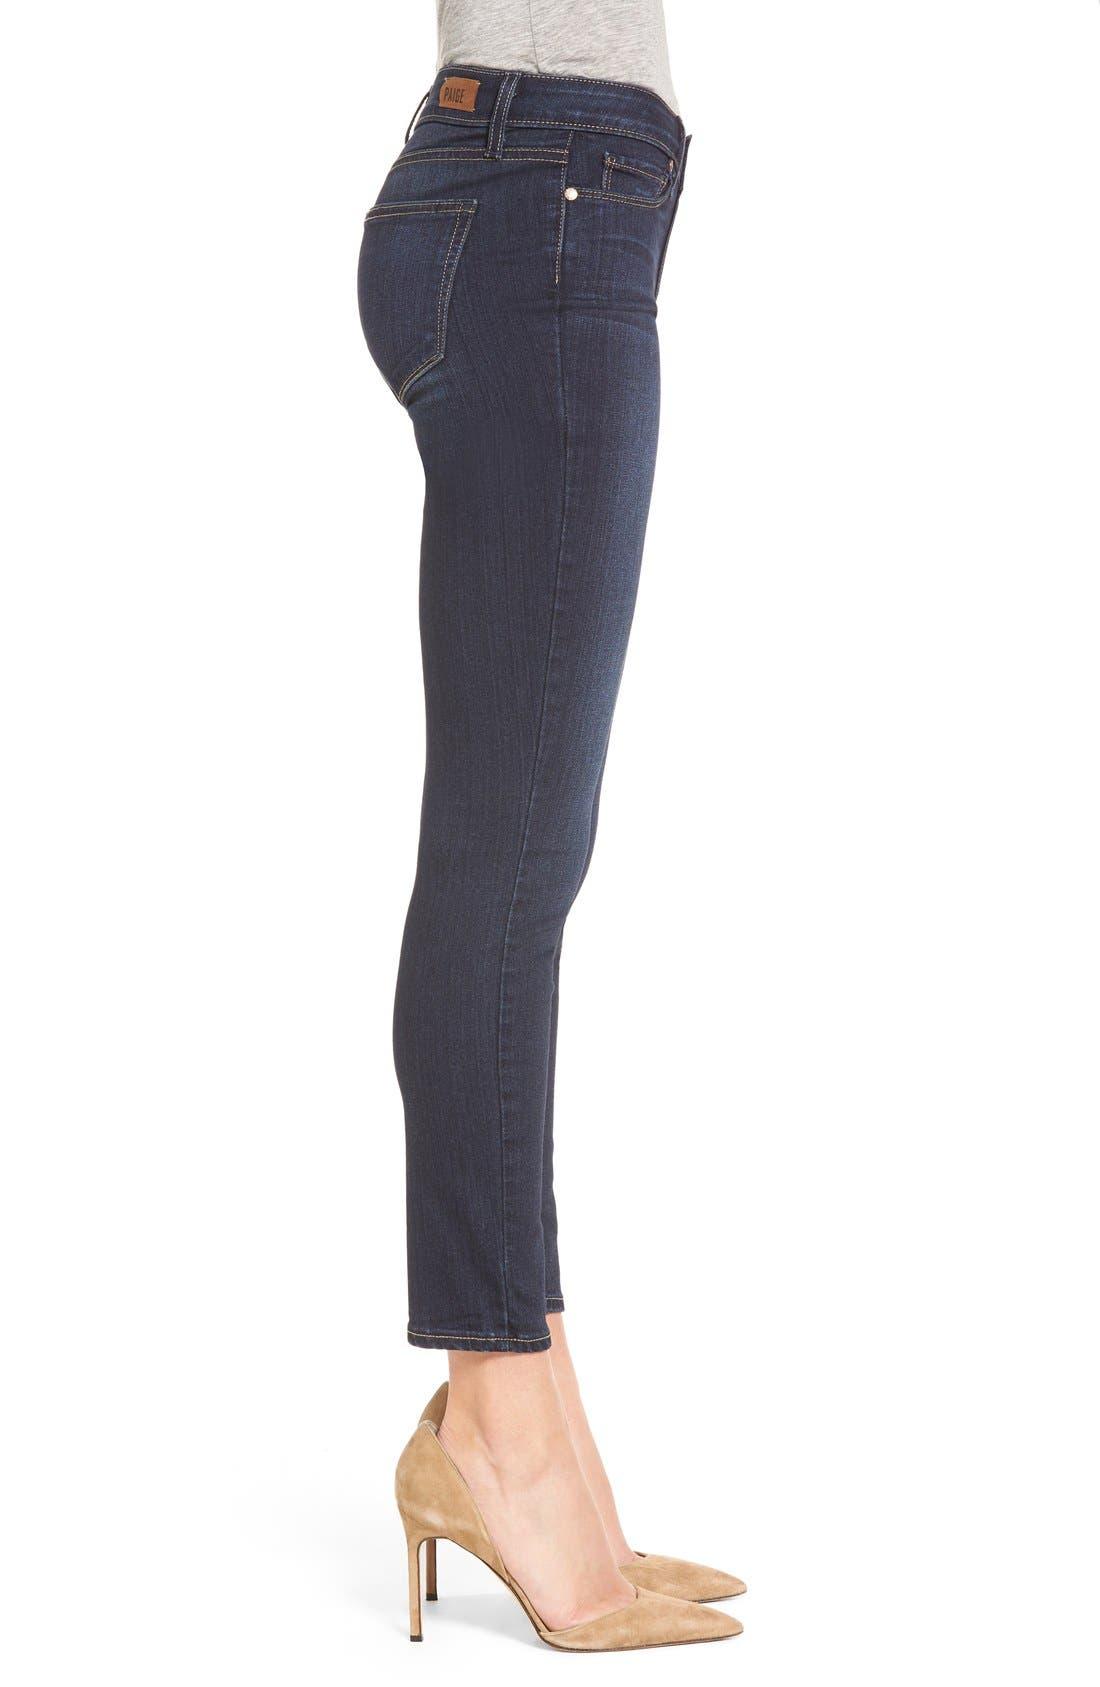 Alternate Image 4  - PAIGE 'Transcend - Verdugo' Ankle Ultra Skinny Jeans (Hartmann) (Nordstrom Exclusive)